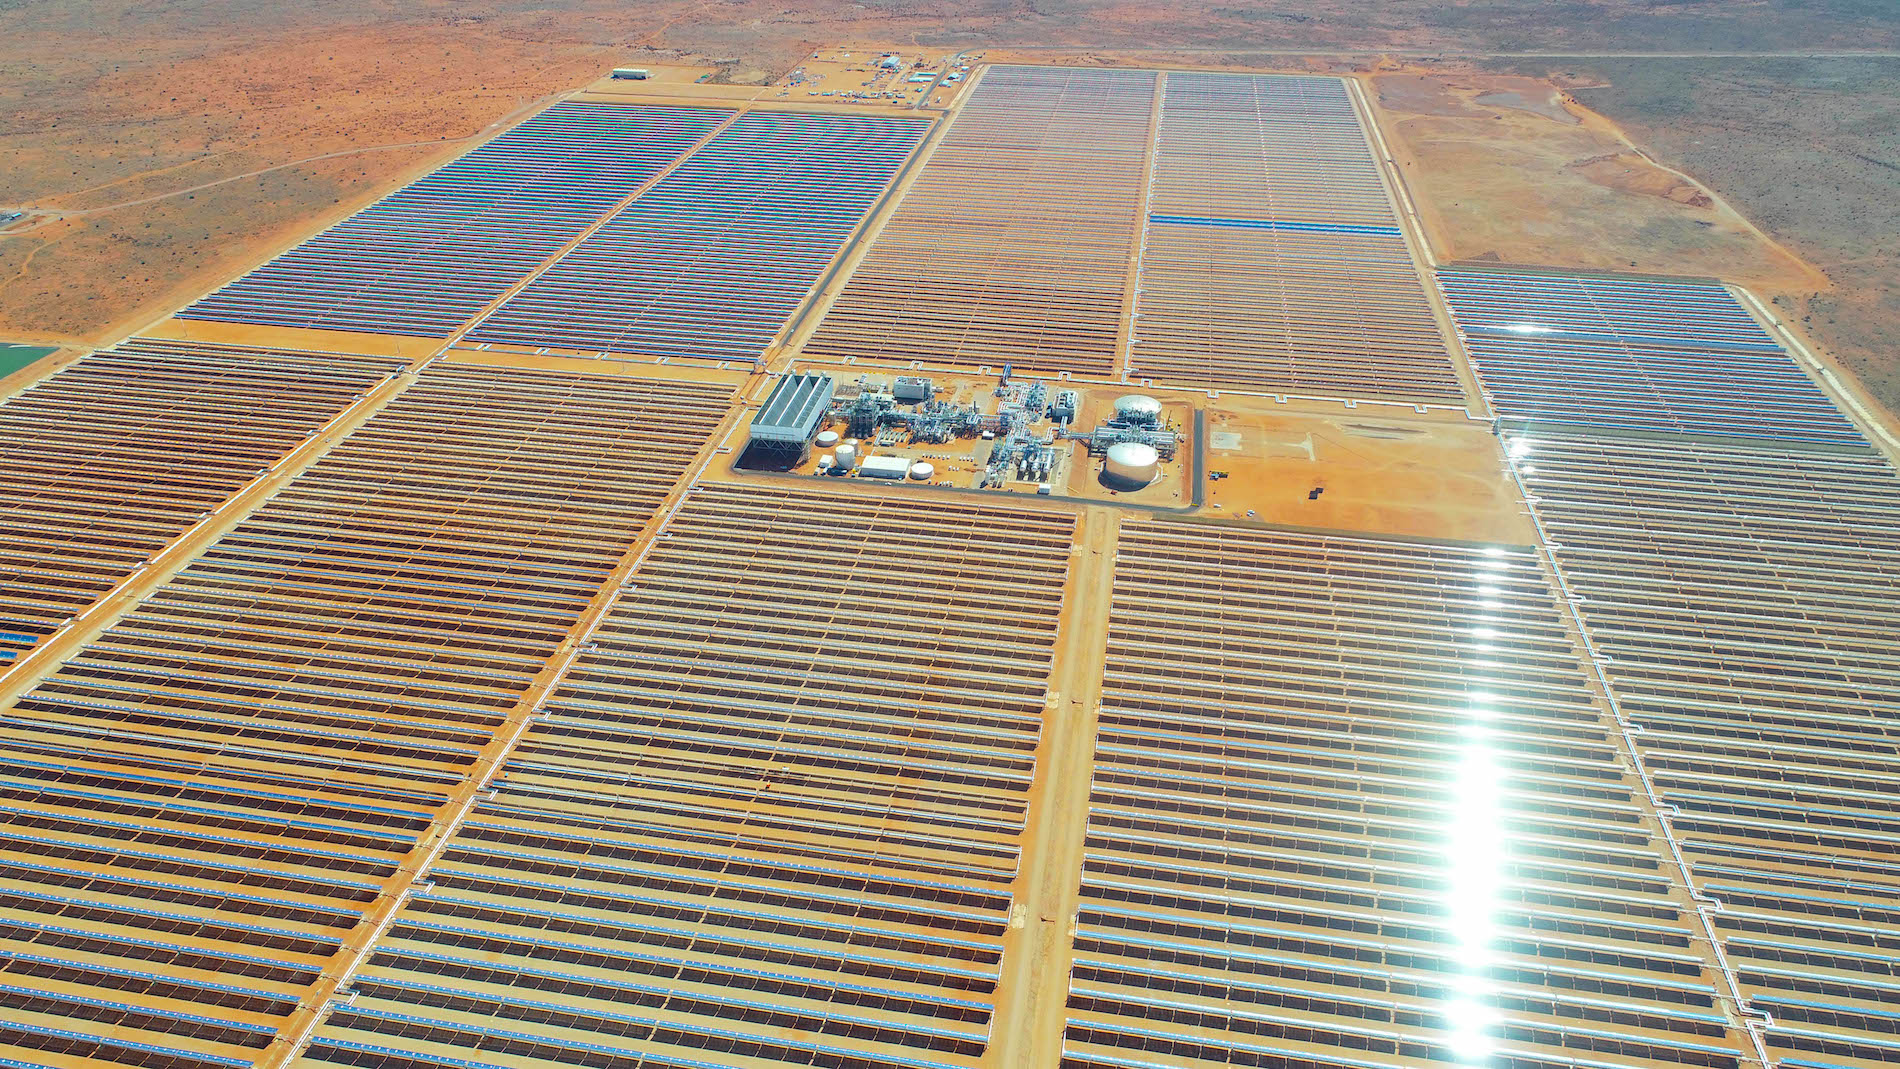 SENER-Ilanga-1-CSP-starts-in-South-Africa-IMAGE@-SENER.jpg